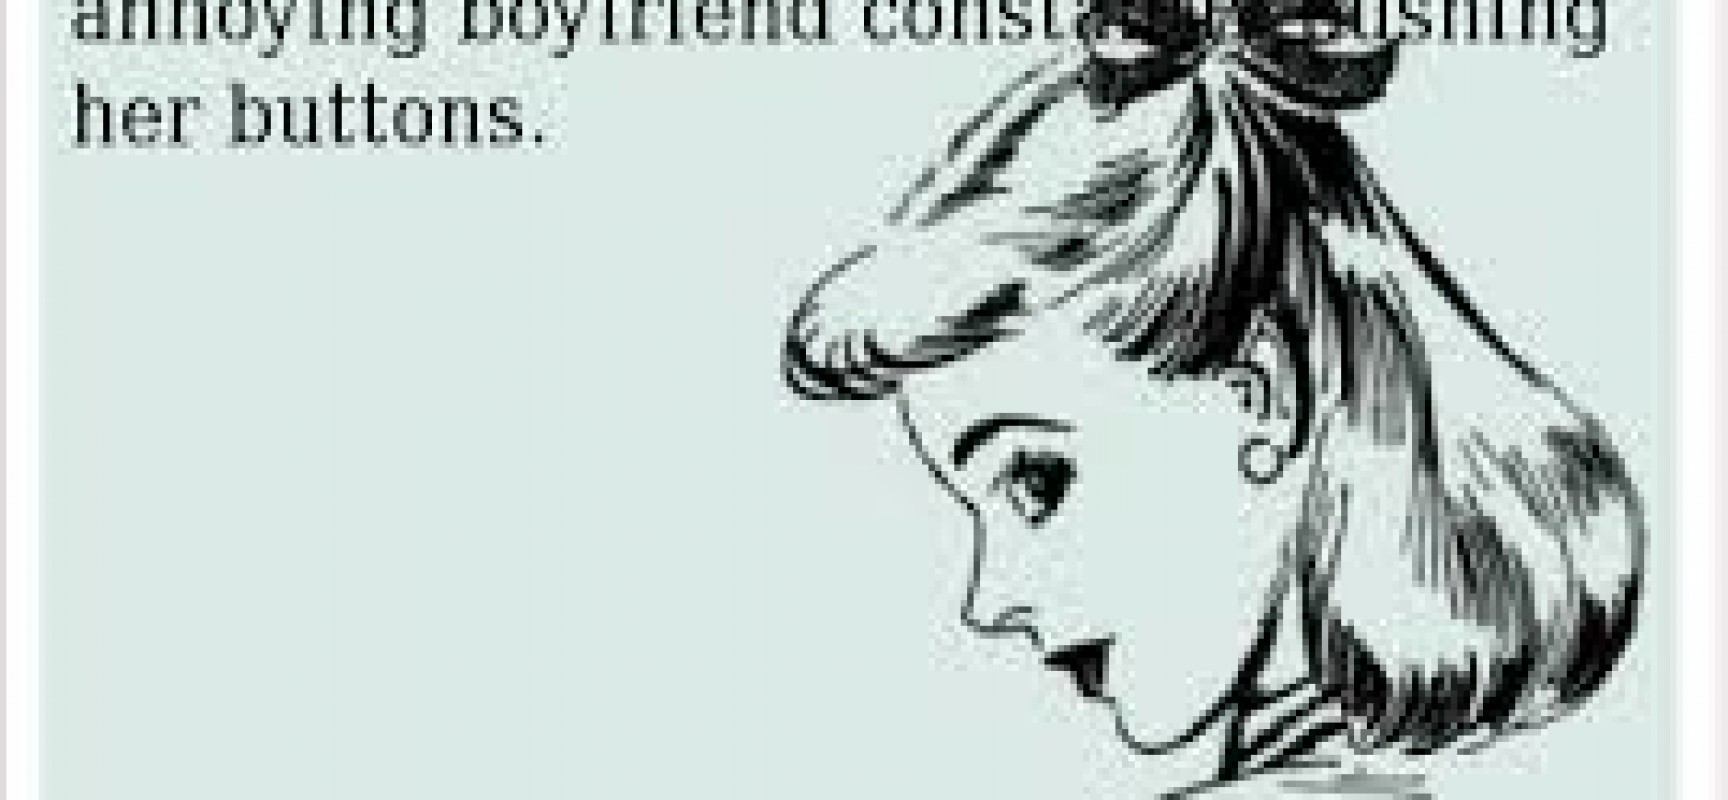 Annoying Girlfriend Quotes. QuotesGram